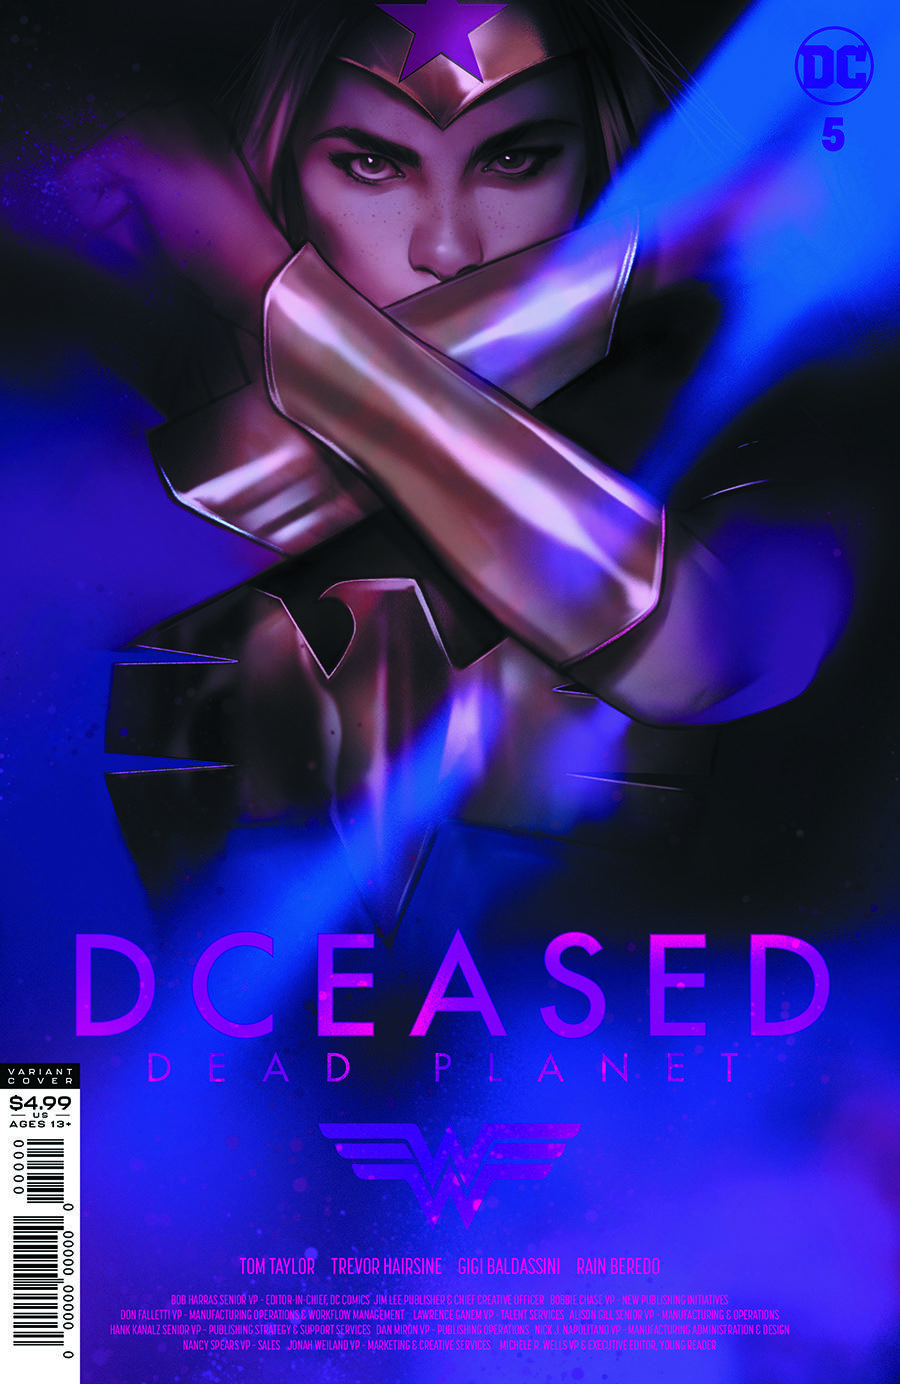 DCEASED DEAD PLANET